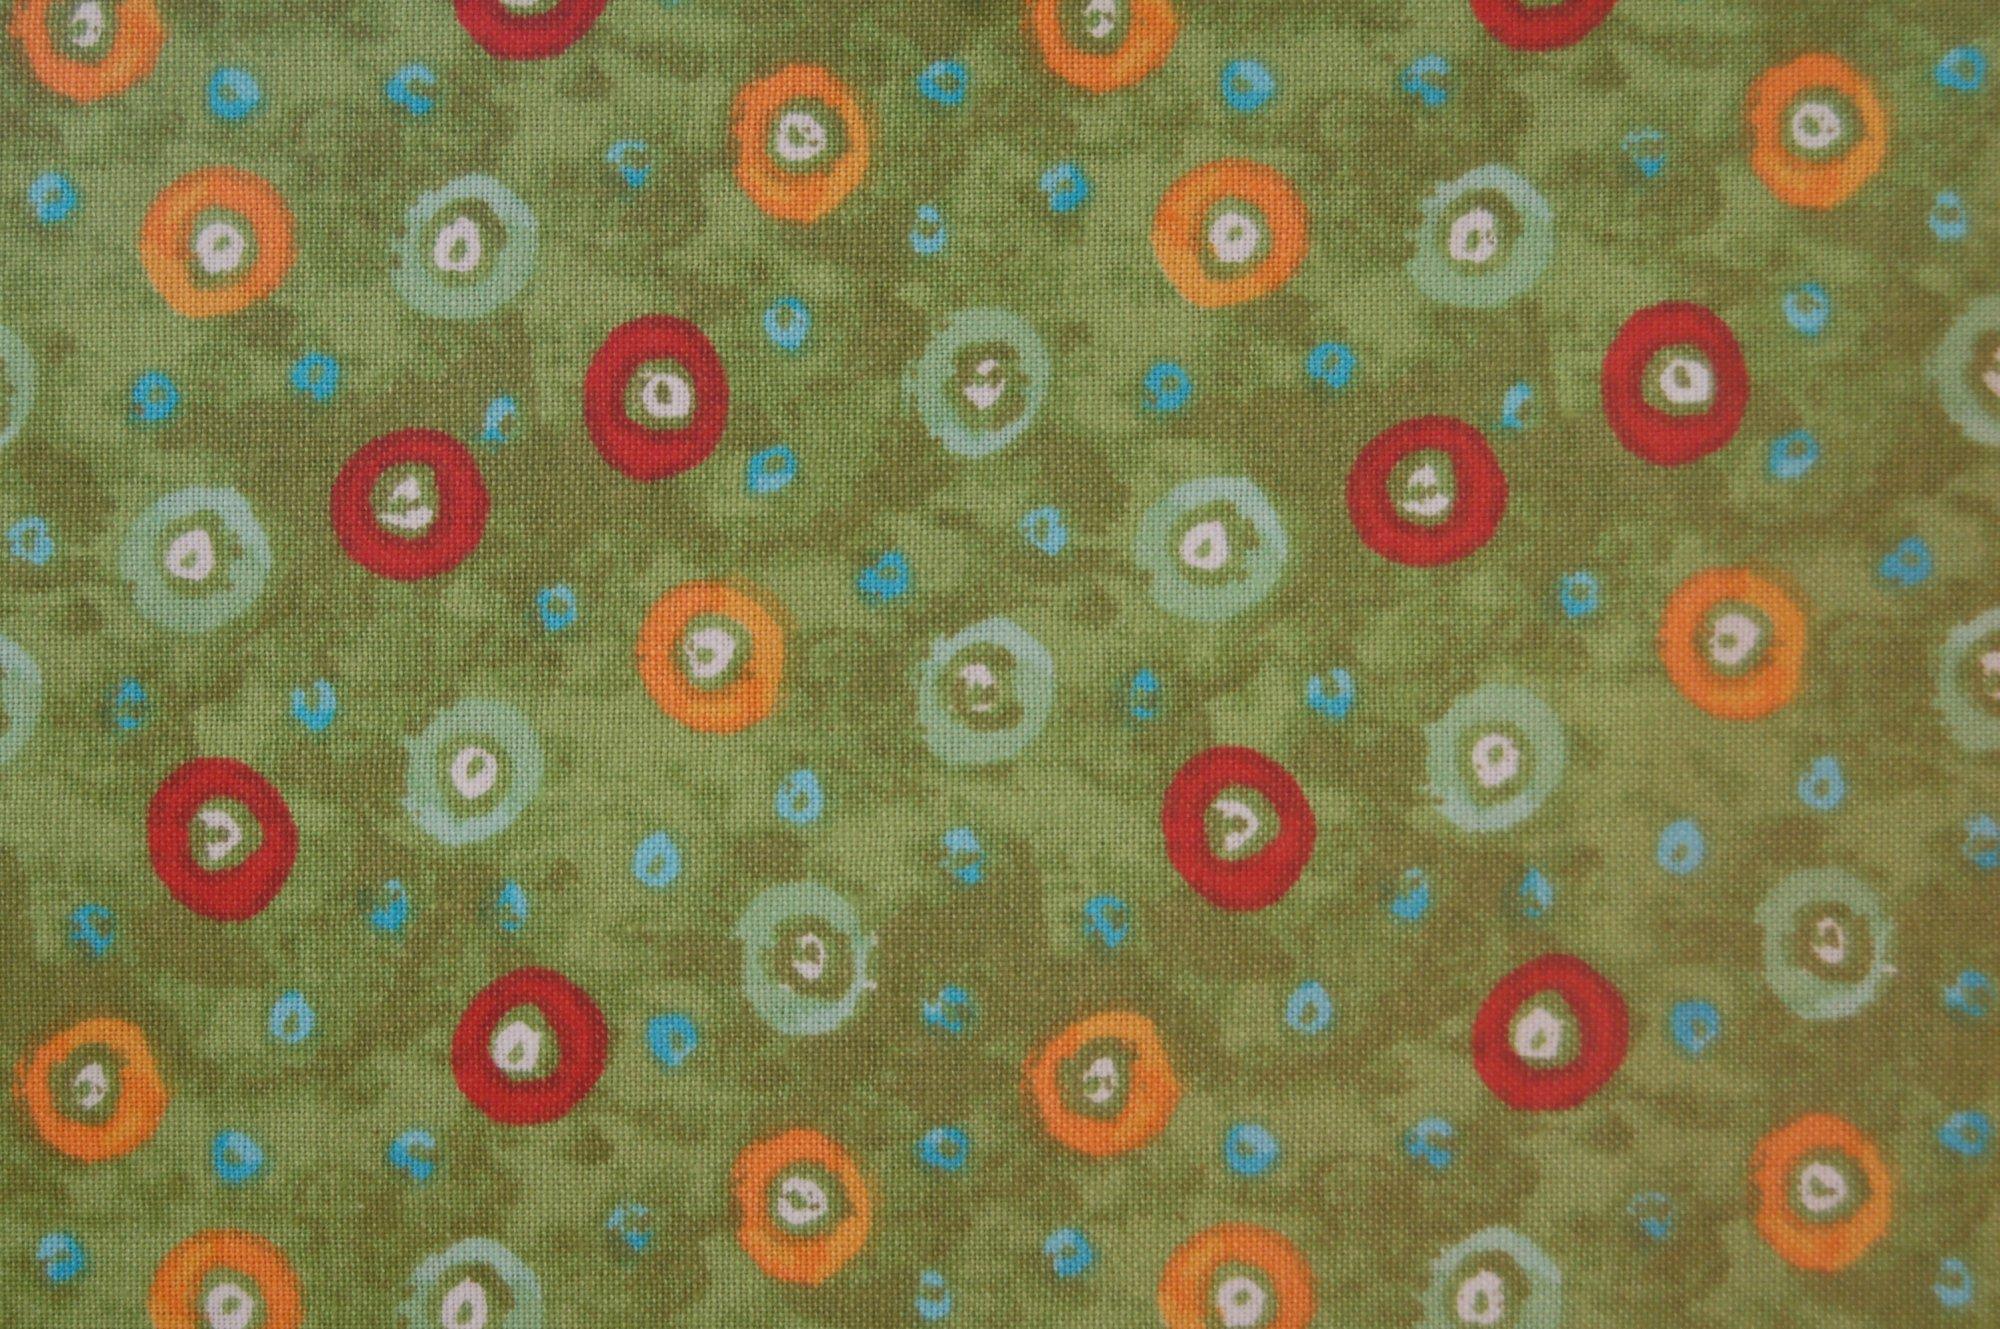 Kassita - Multi Dots Green from 3 Wishes